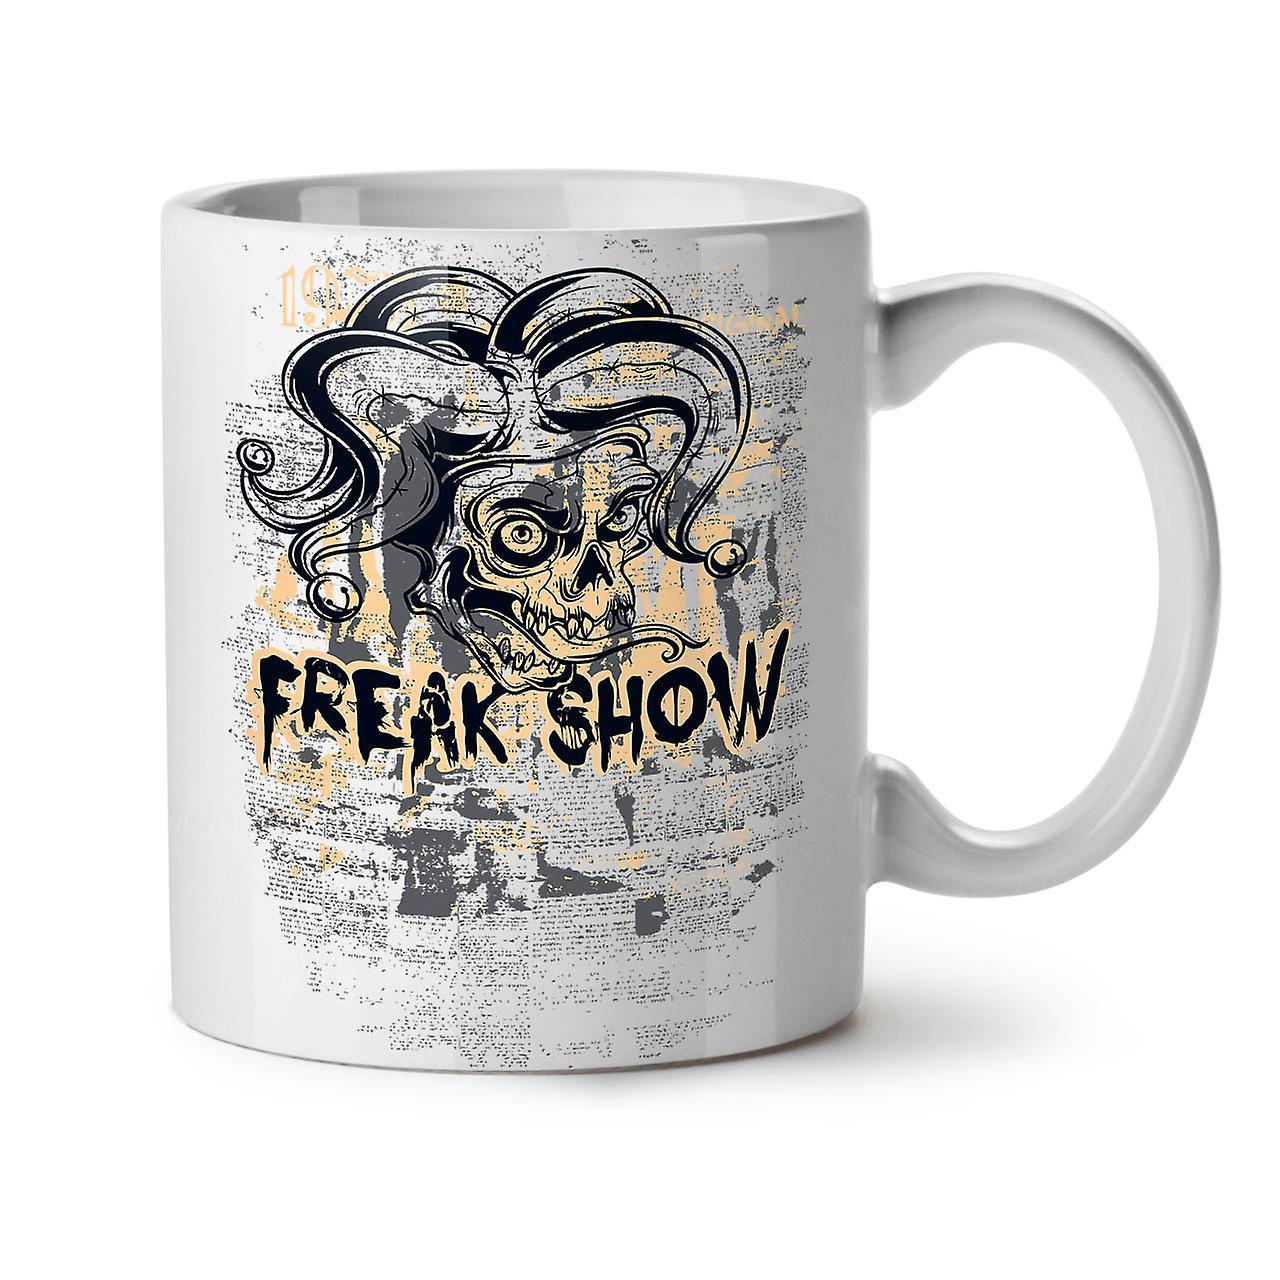 Horreur Thé Céramique Freak Café Show Blanc Tasse 11 OzWellcoda Nouveau NPkXnZw08O